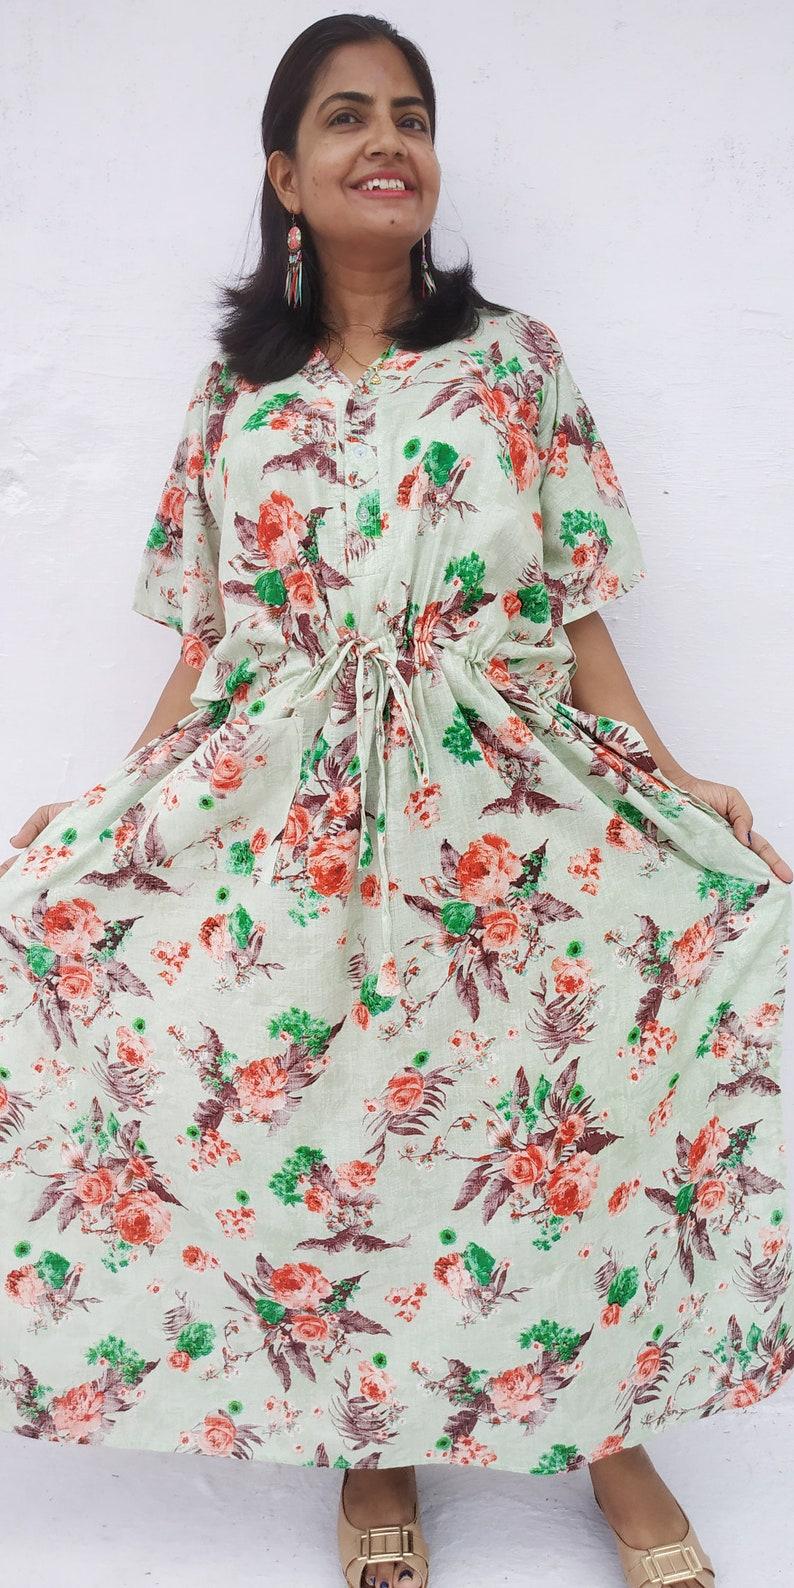 e2862d7949 Women s maternity gown hospital robe long caftan kaftan